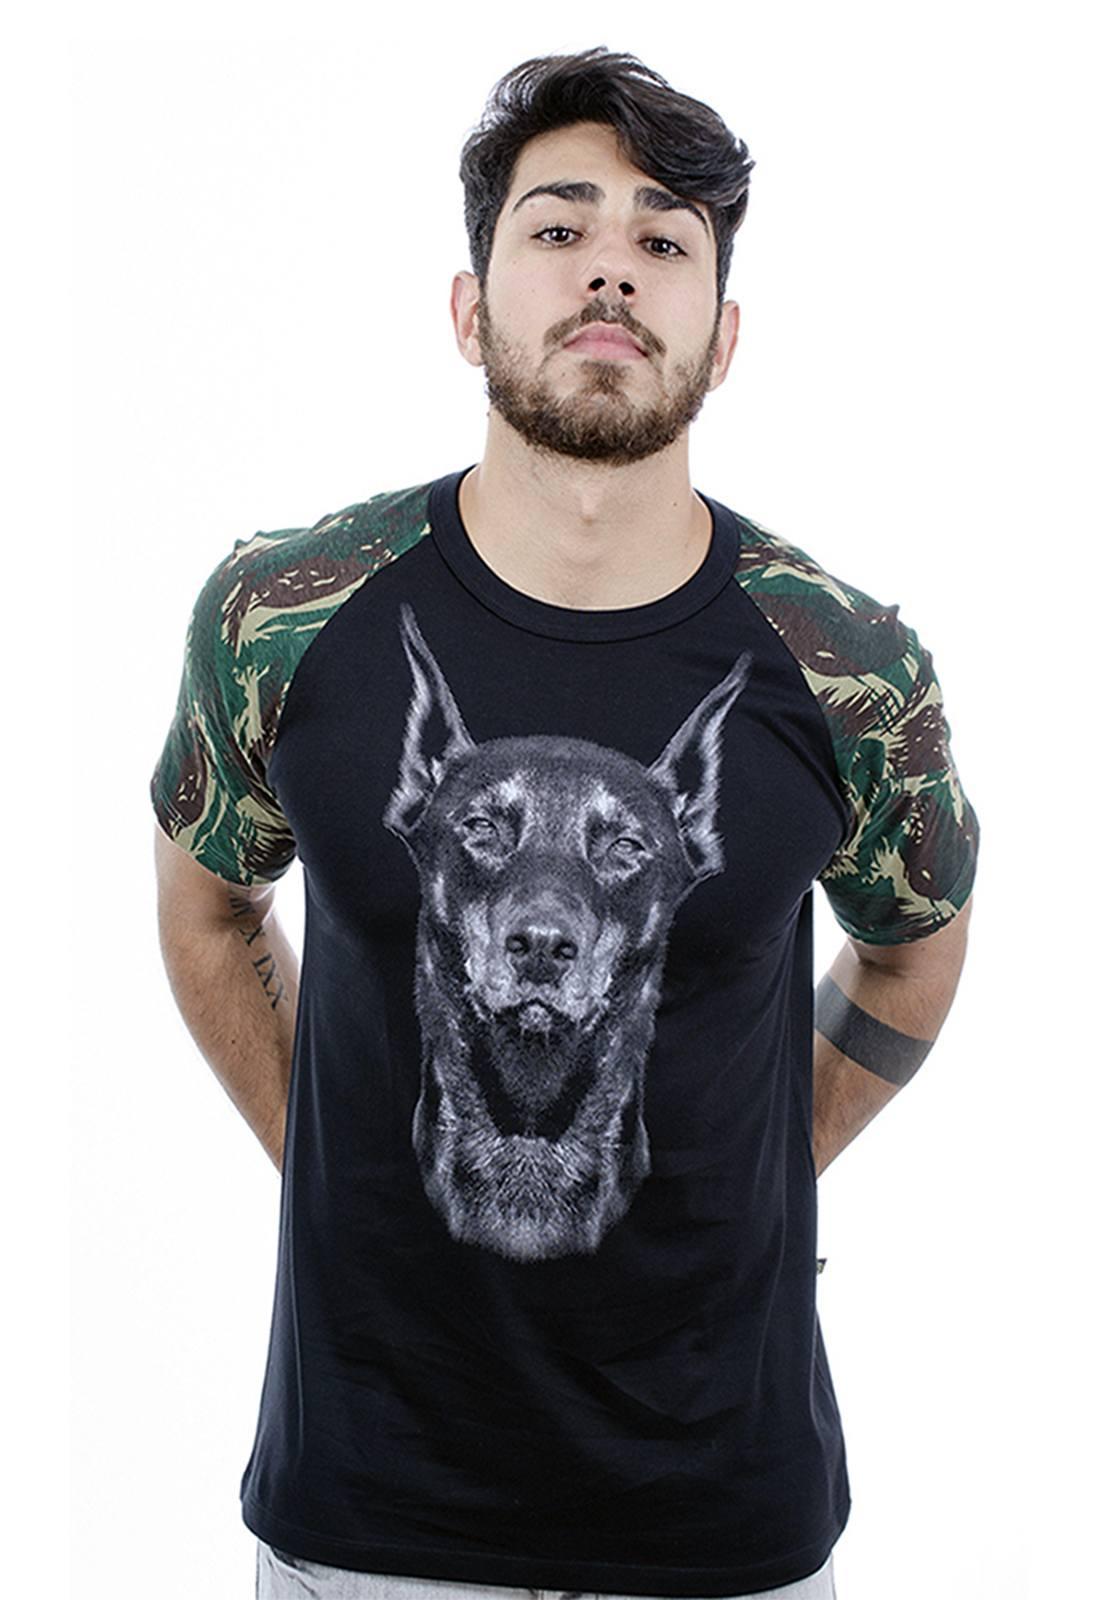 Camiseta masculina preta Army - 100% algodão - Hardivision